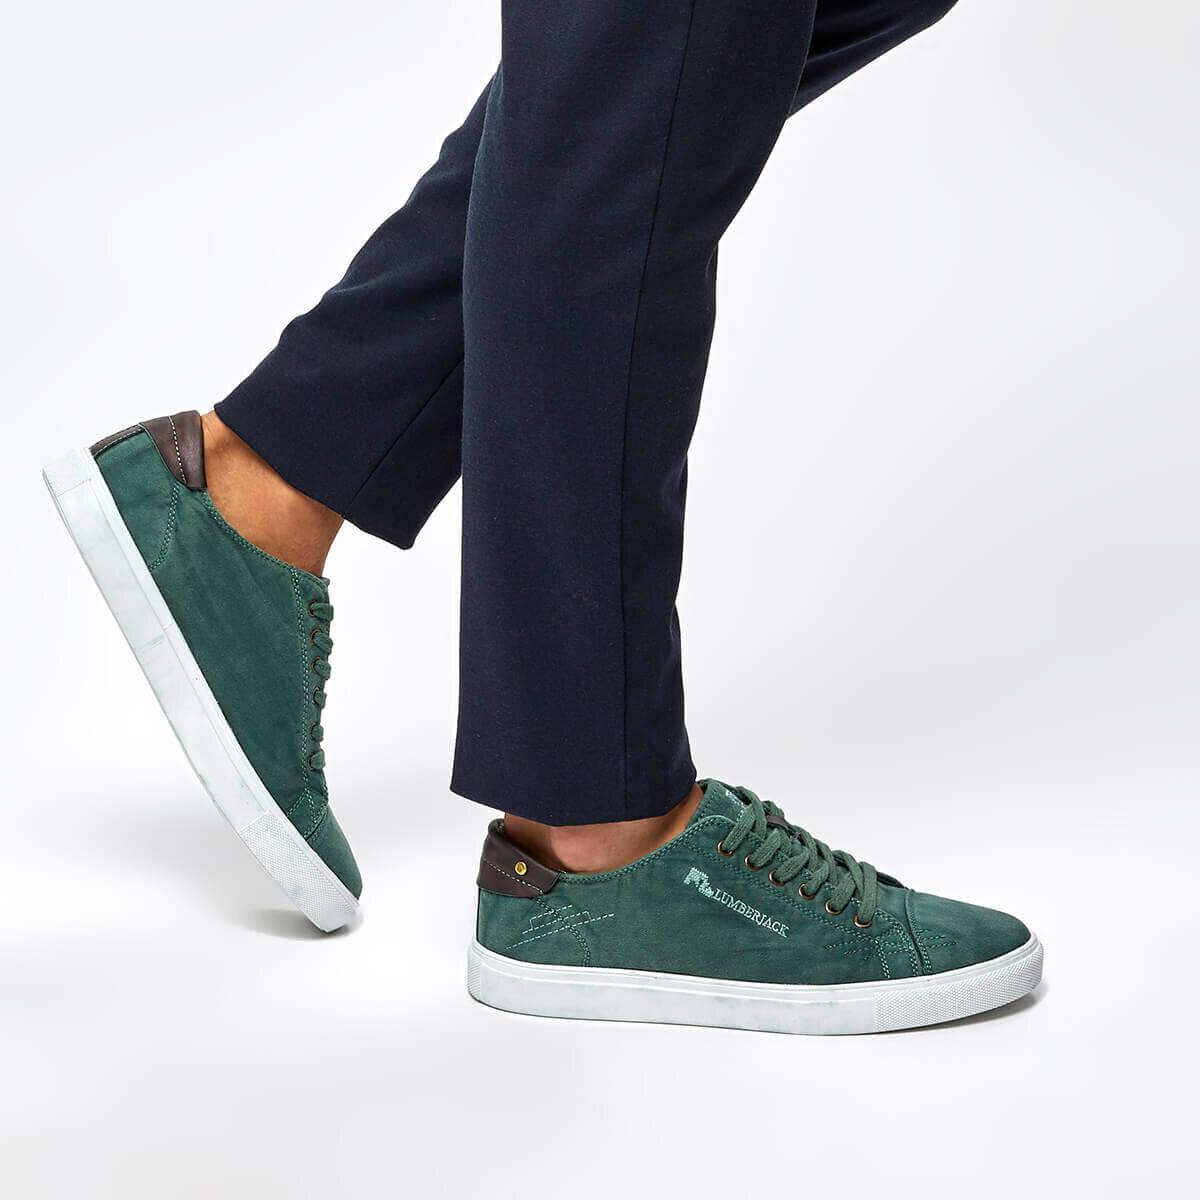 FLO DALTON Green Men 'S Sneaker LUMBERJACK